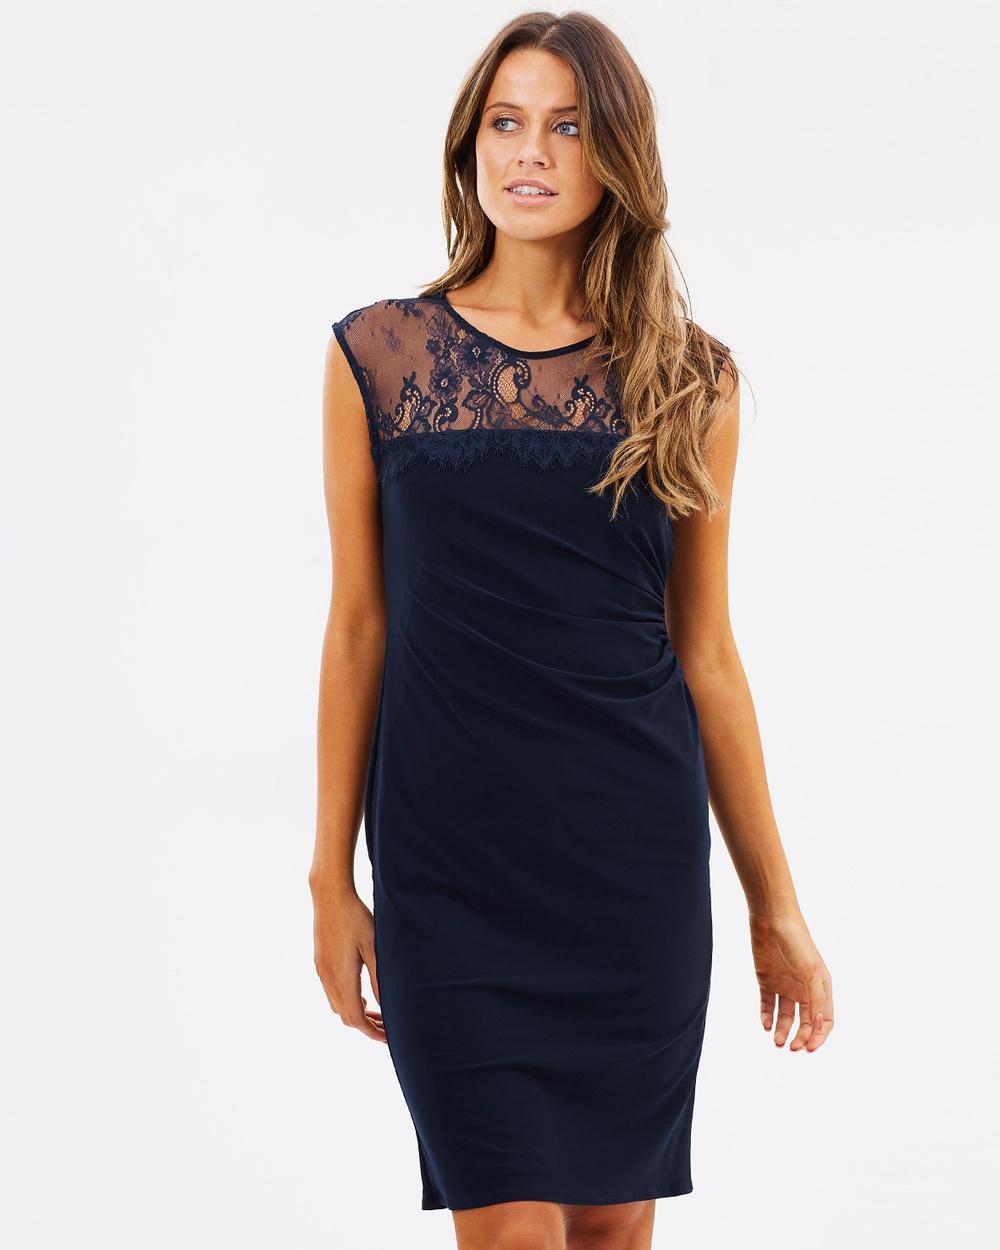 Wallis Lace Yoke Ruch Side Dress Dresses Navy Blue Lace Yoke Ruch Side Dress